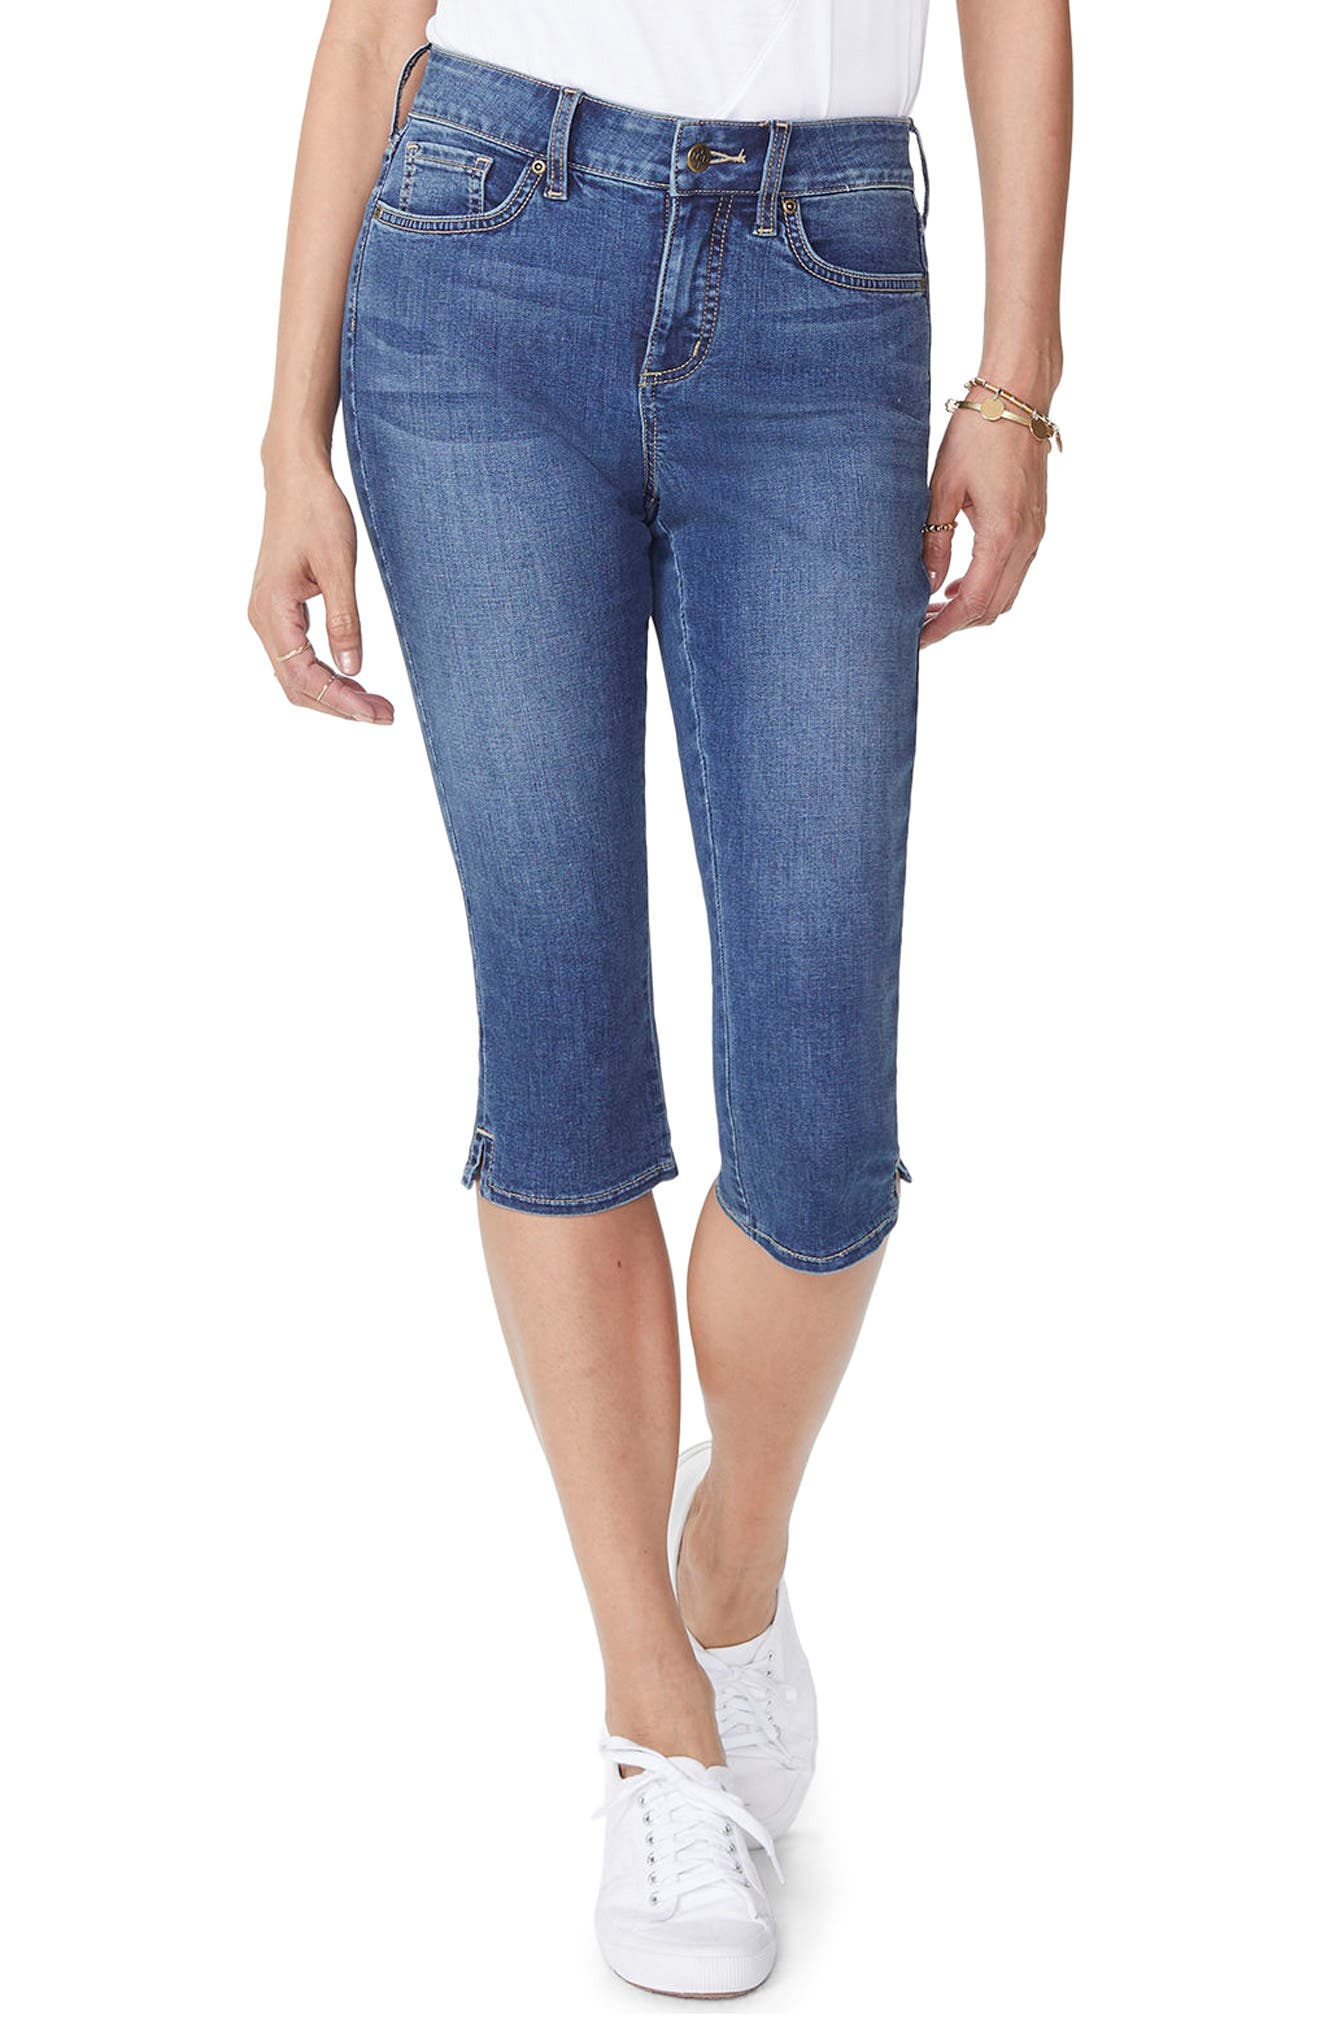 NYDJ Skinny Capri Jeans (Zimbali)